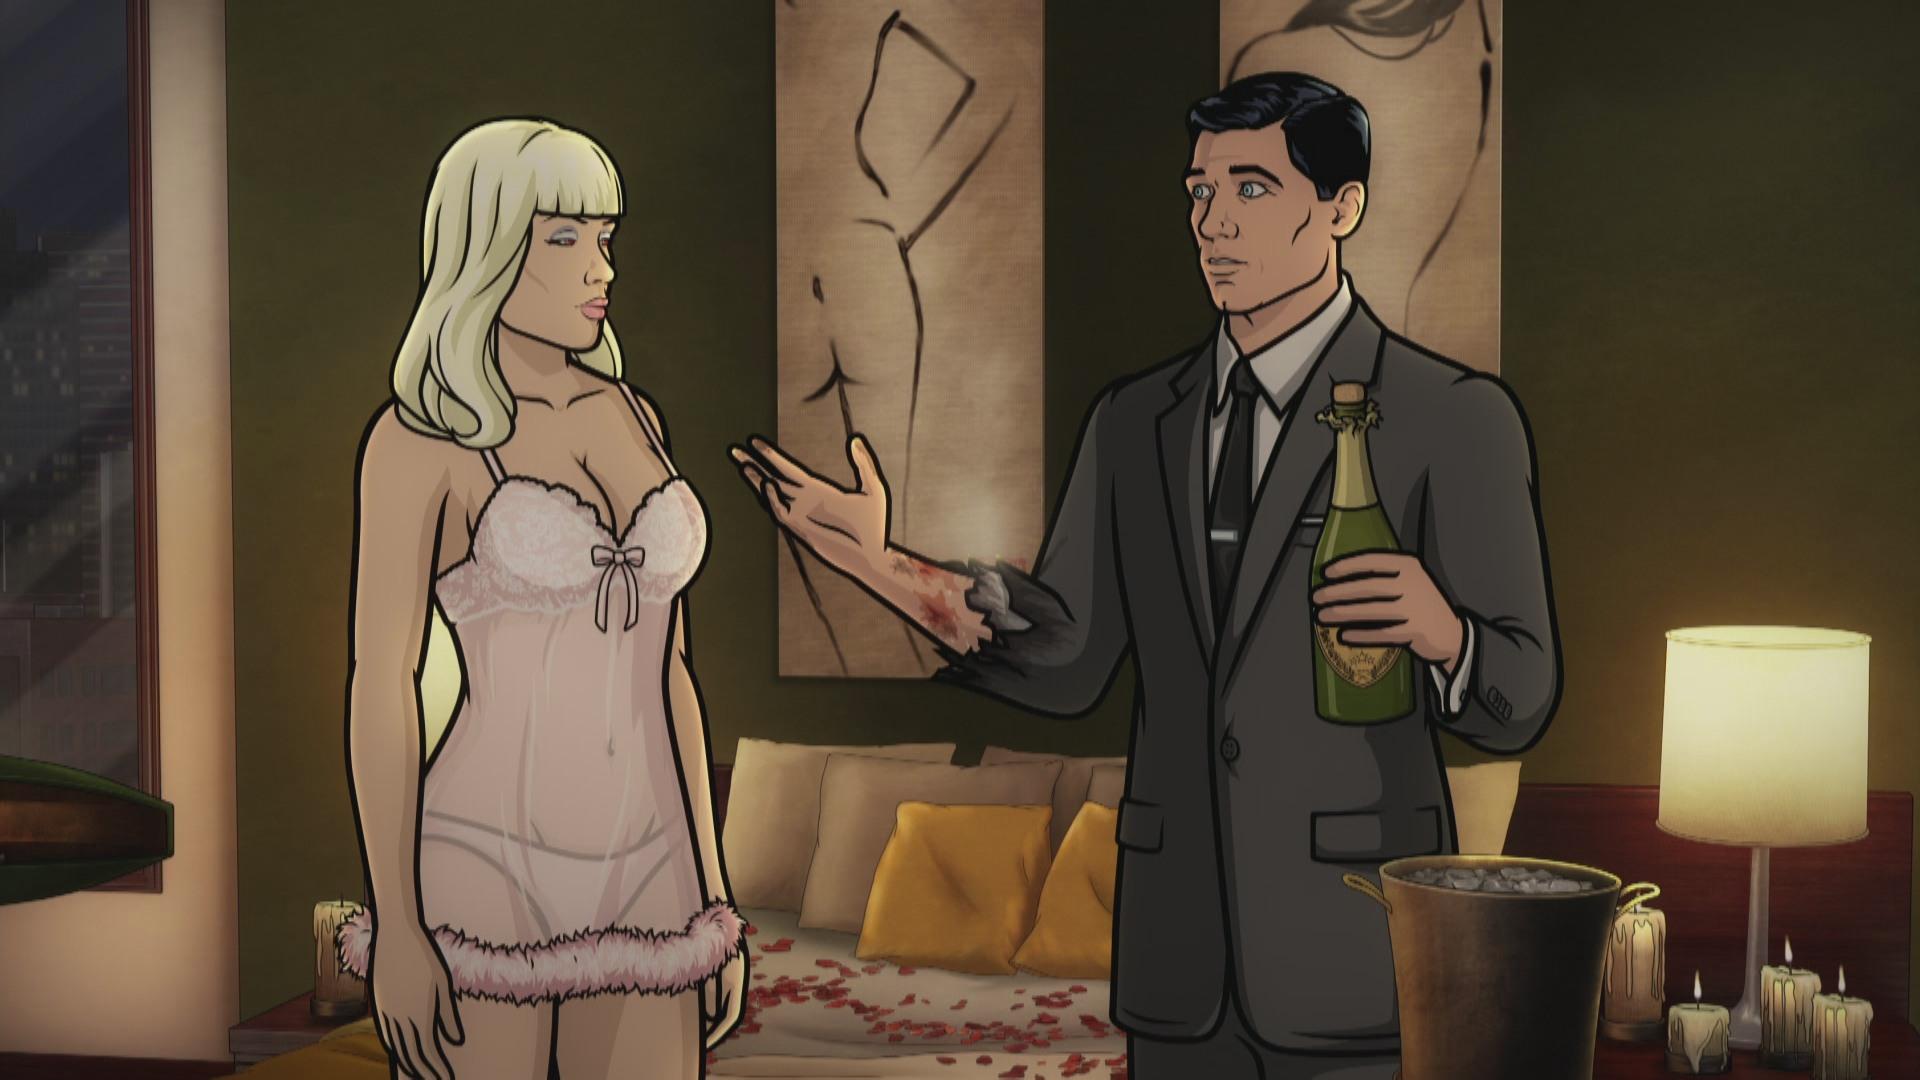 Adult dating services danbury connecticut